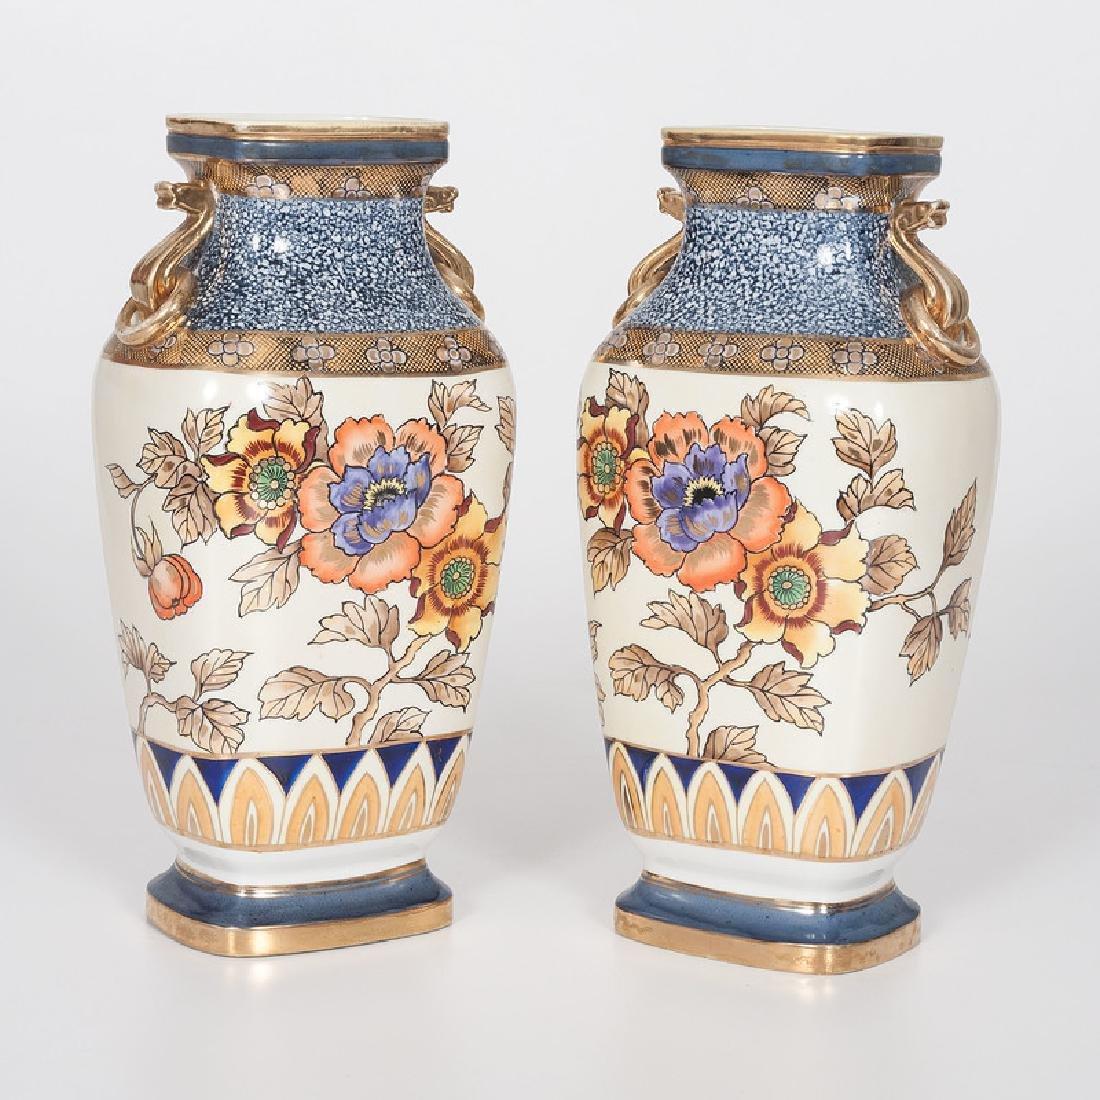 Noritake Hand-Painted Vases